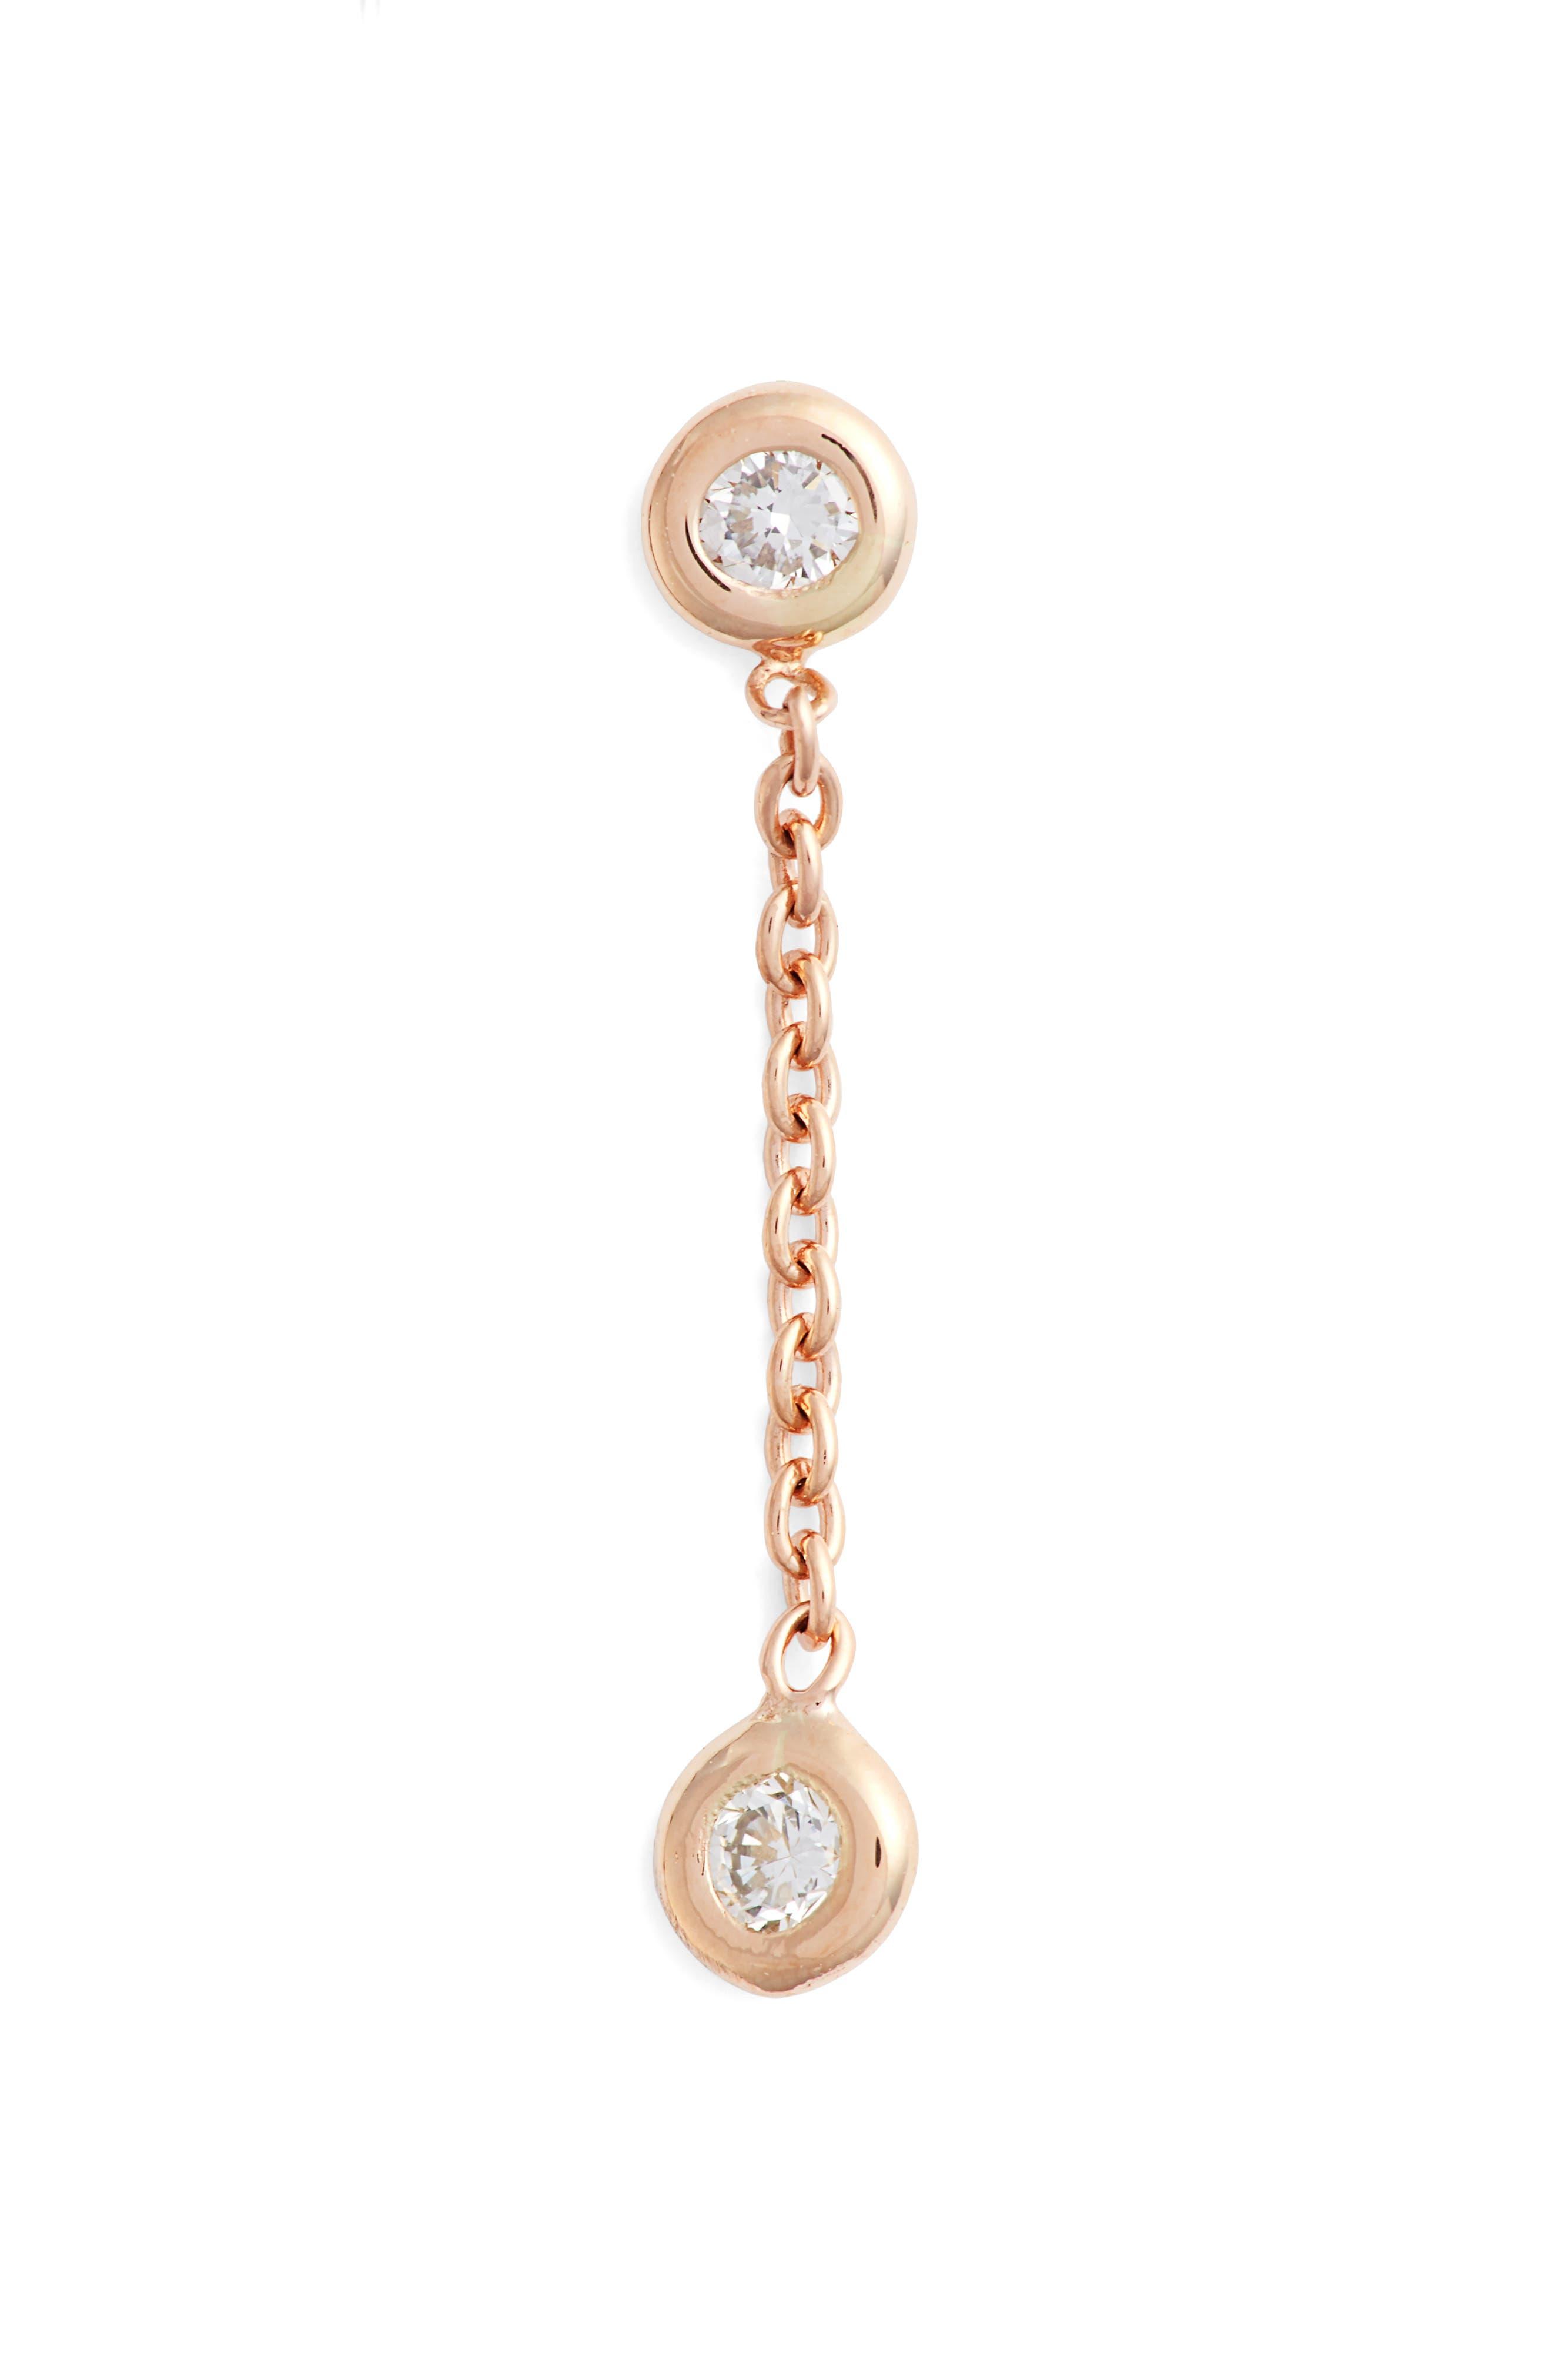 KISMET BY MILKA, Double Diamond Solitaire Chain Earring, Main thumbnail 1, color, ROSE GOLD/ DIAMOND